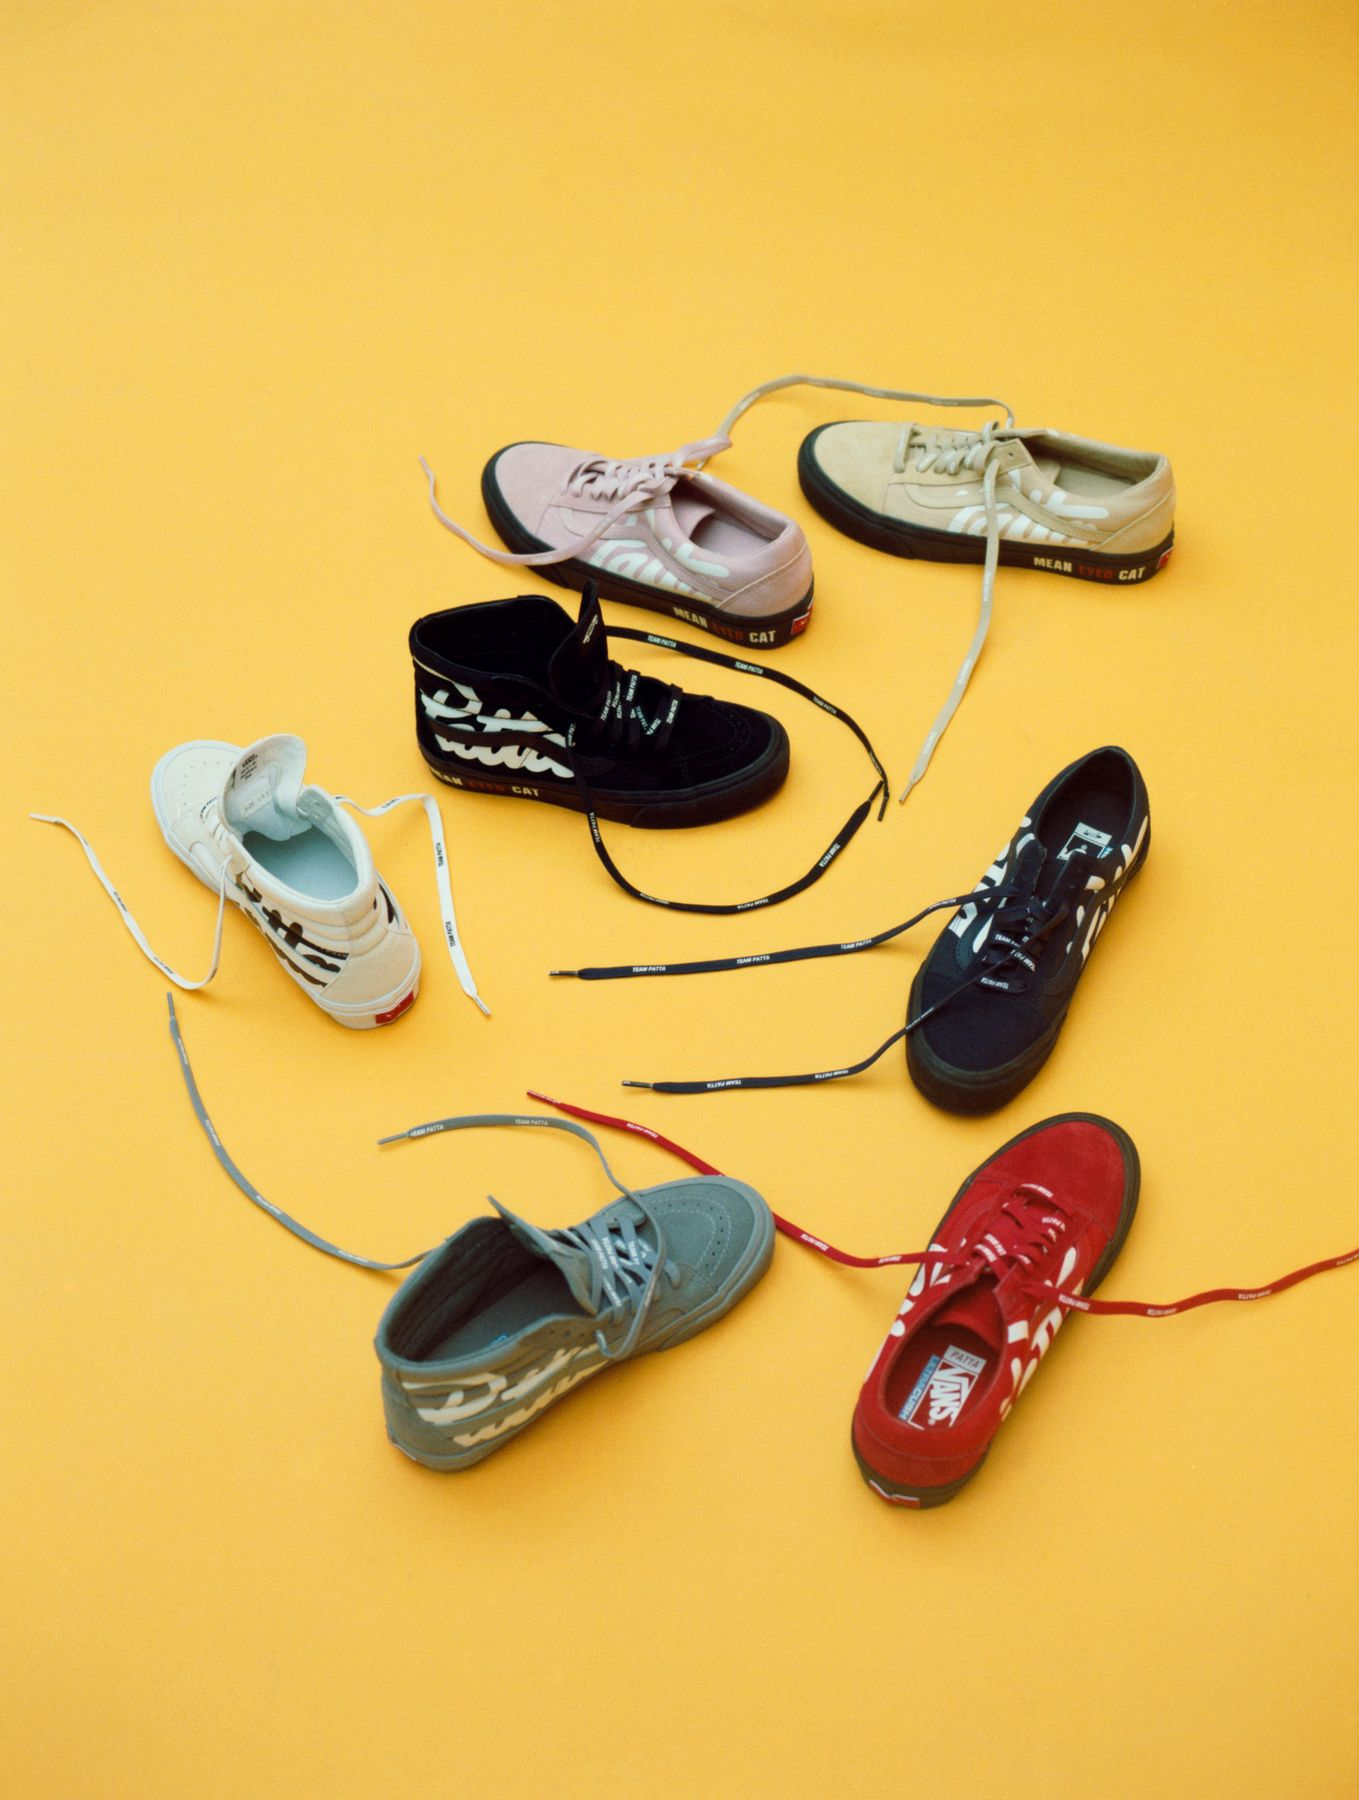 Vans Vault x Patta - Old Skool LX &Sk8-Hi Reissue LX collection